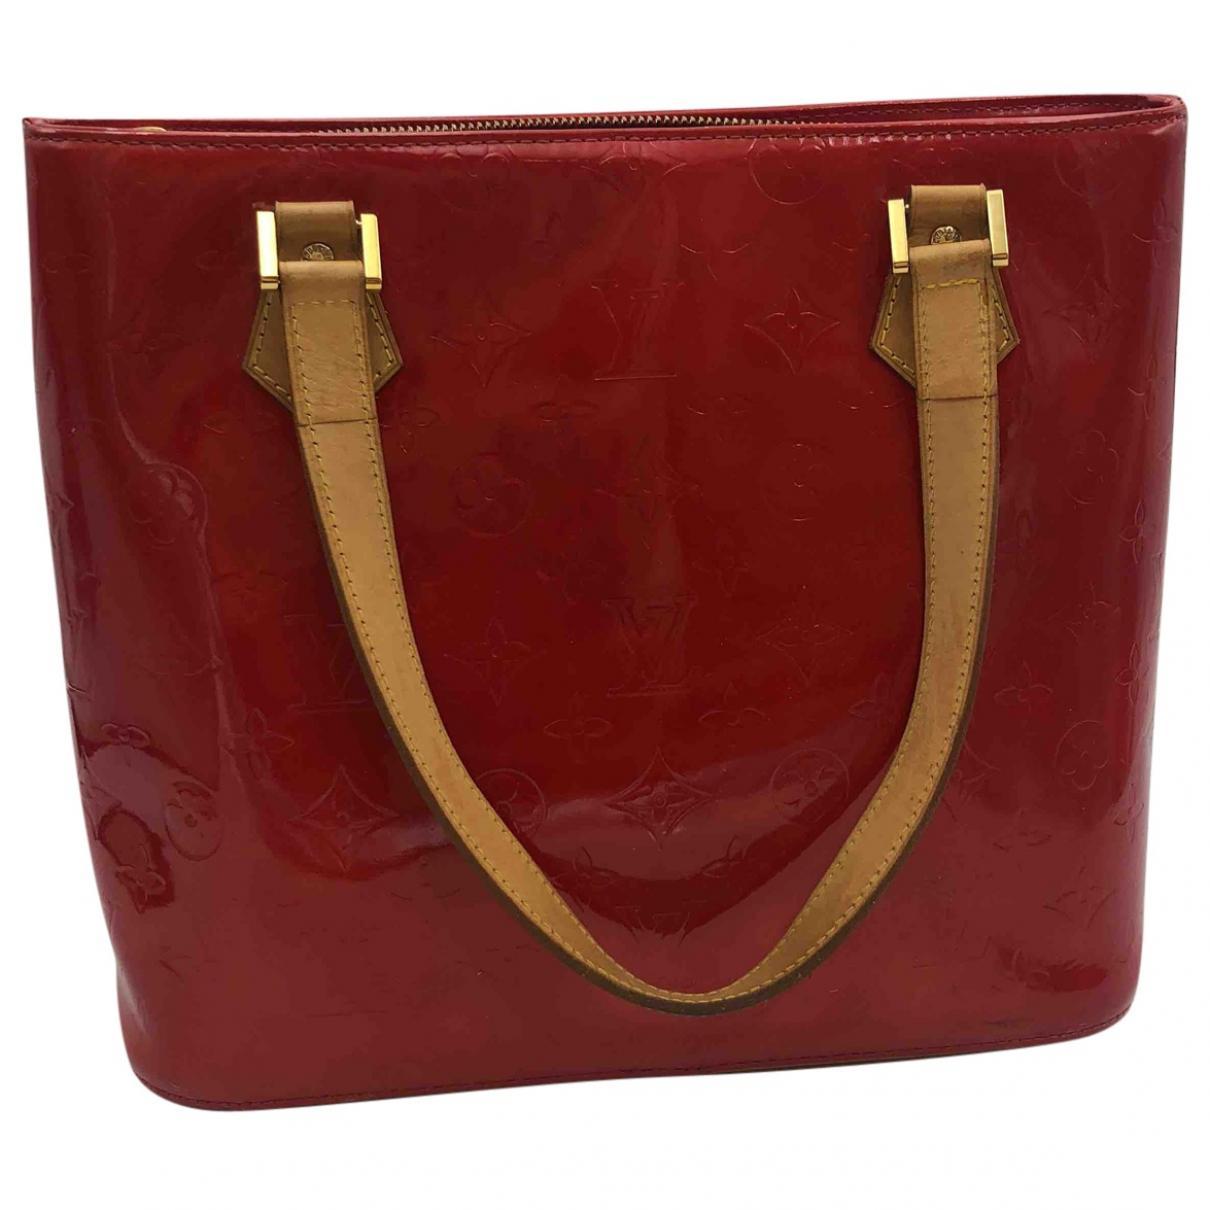 e049106ac636 Louis Vuitton Handbag Red Patent Leather - Handbag Photos ...